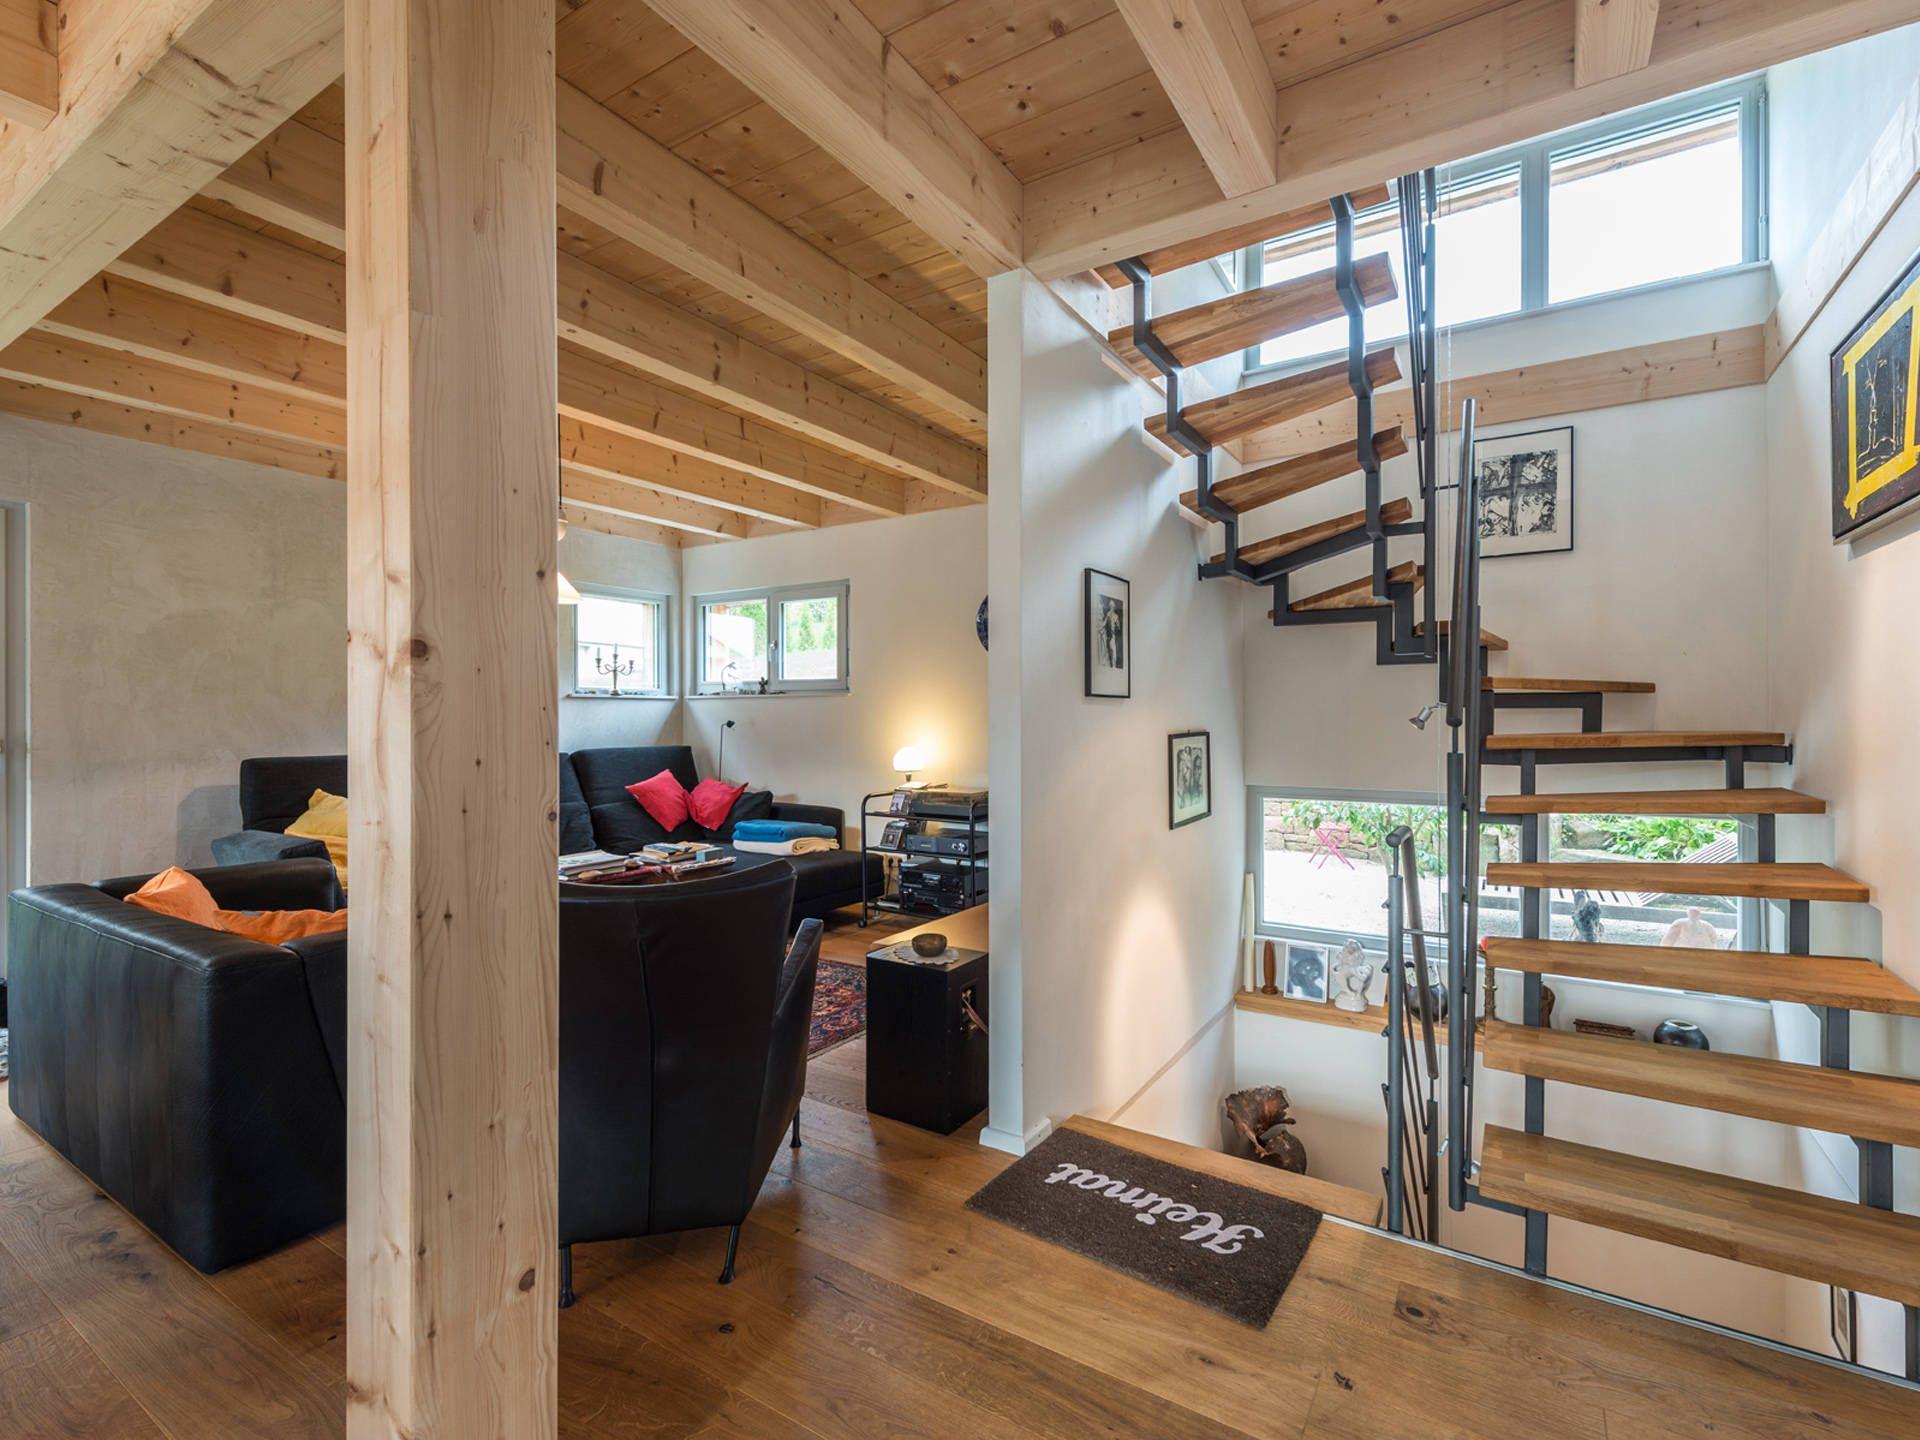 treppe im haus design 120 von frammelsberger holzhaus. Black Bedroom Furniture Sets. Home Design Ideas